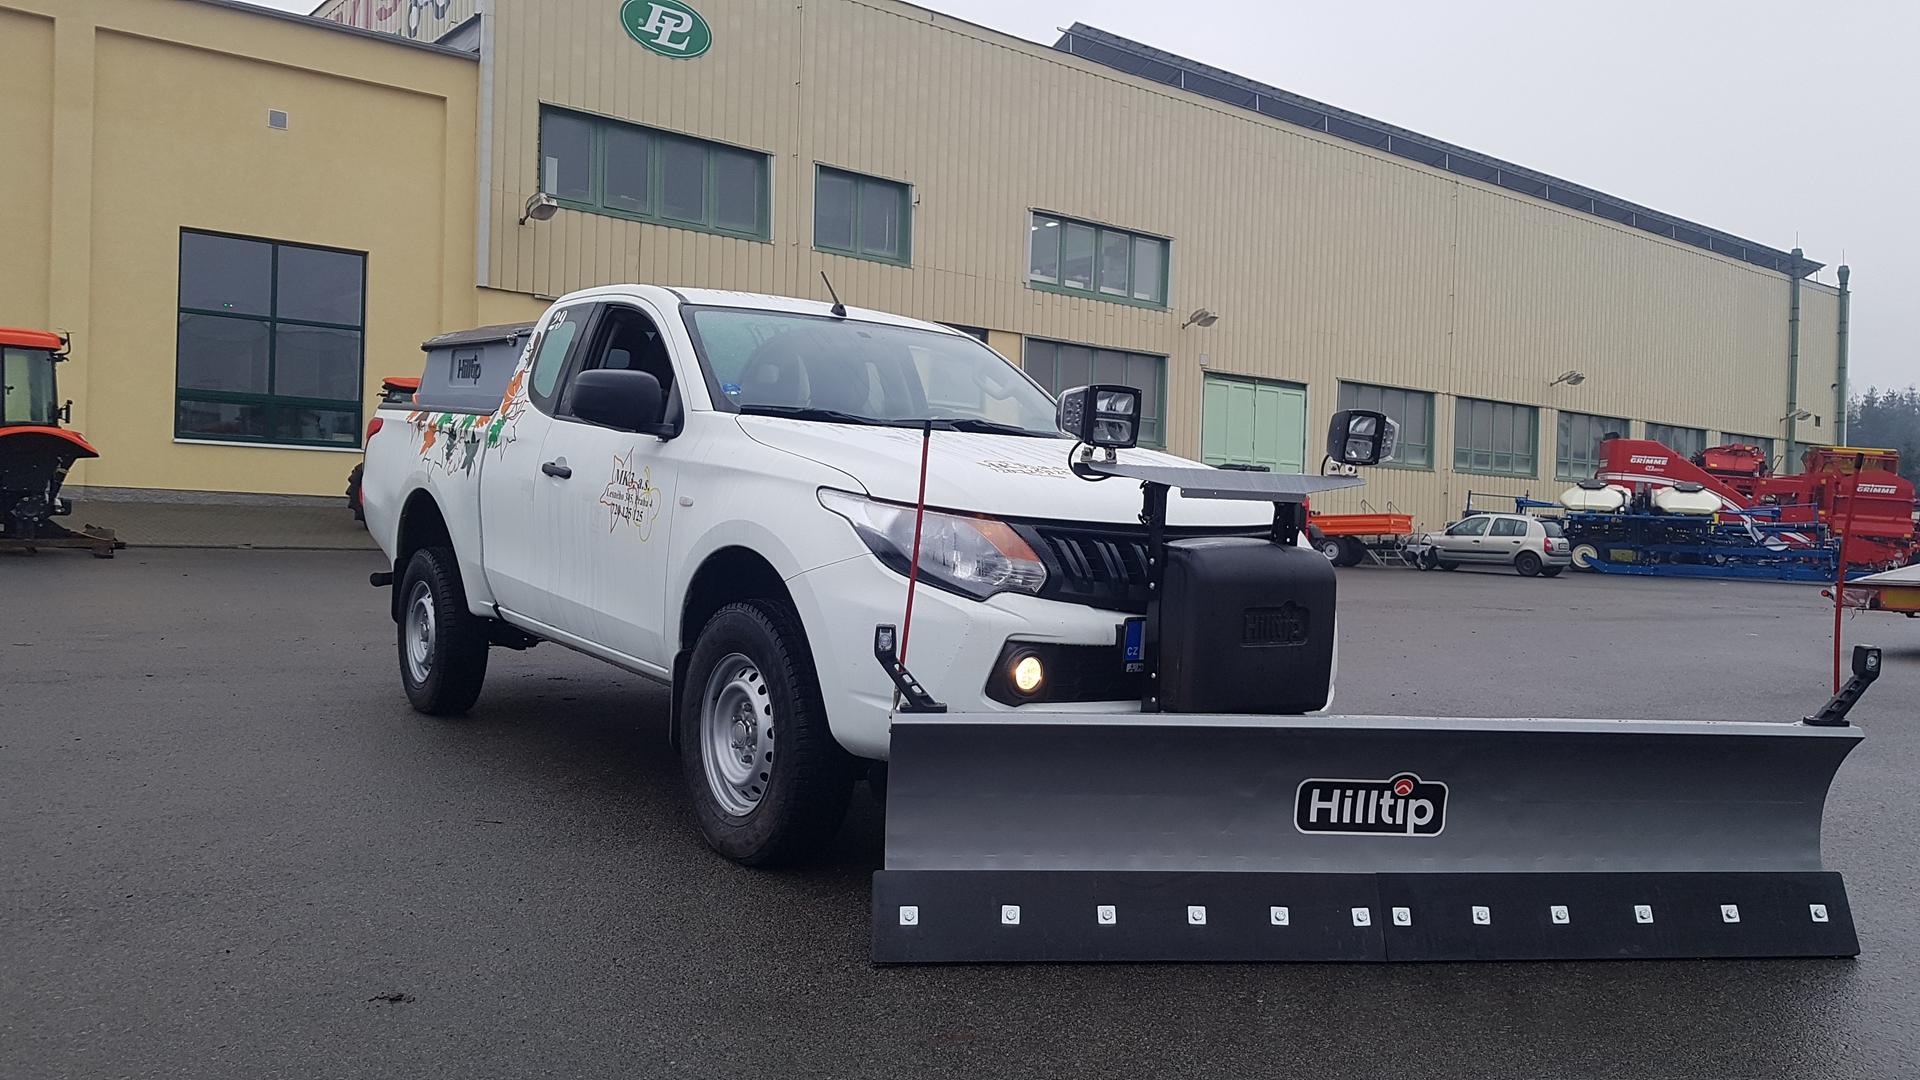 Hilltip-2250-rovny-pluh-rozmetadlo-850-litru-pro-firmu-MK3-(1).jpg